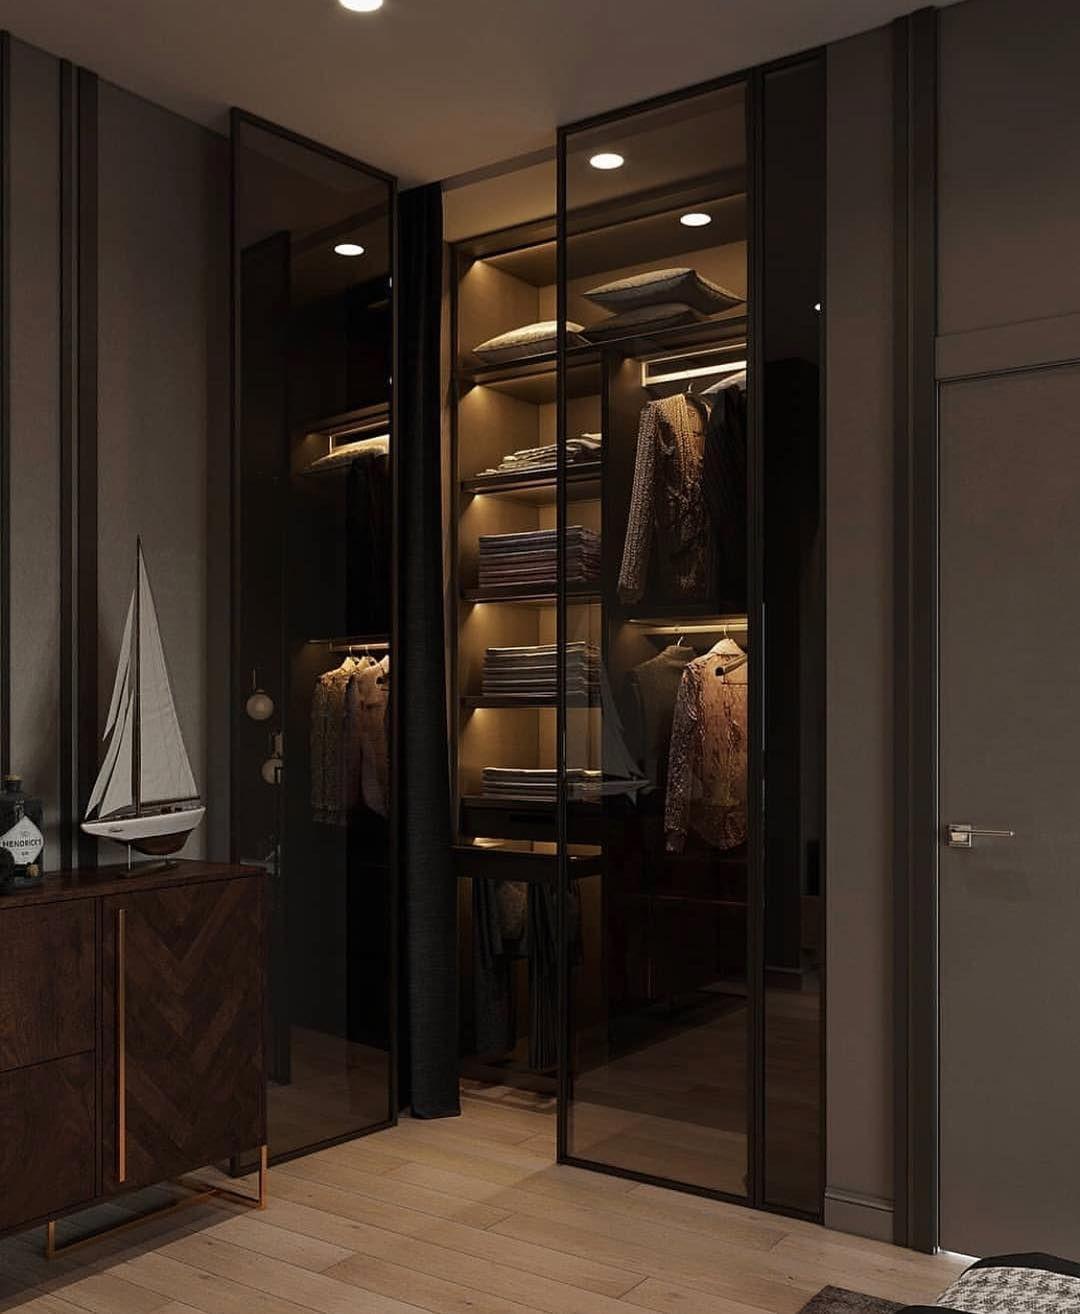 Stunning 28 Best Furniture Paint For Wood Uk Luxe Kast Slaapkamer Interieur Slaapkamerdecoratieideeen